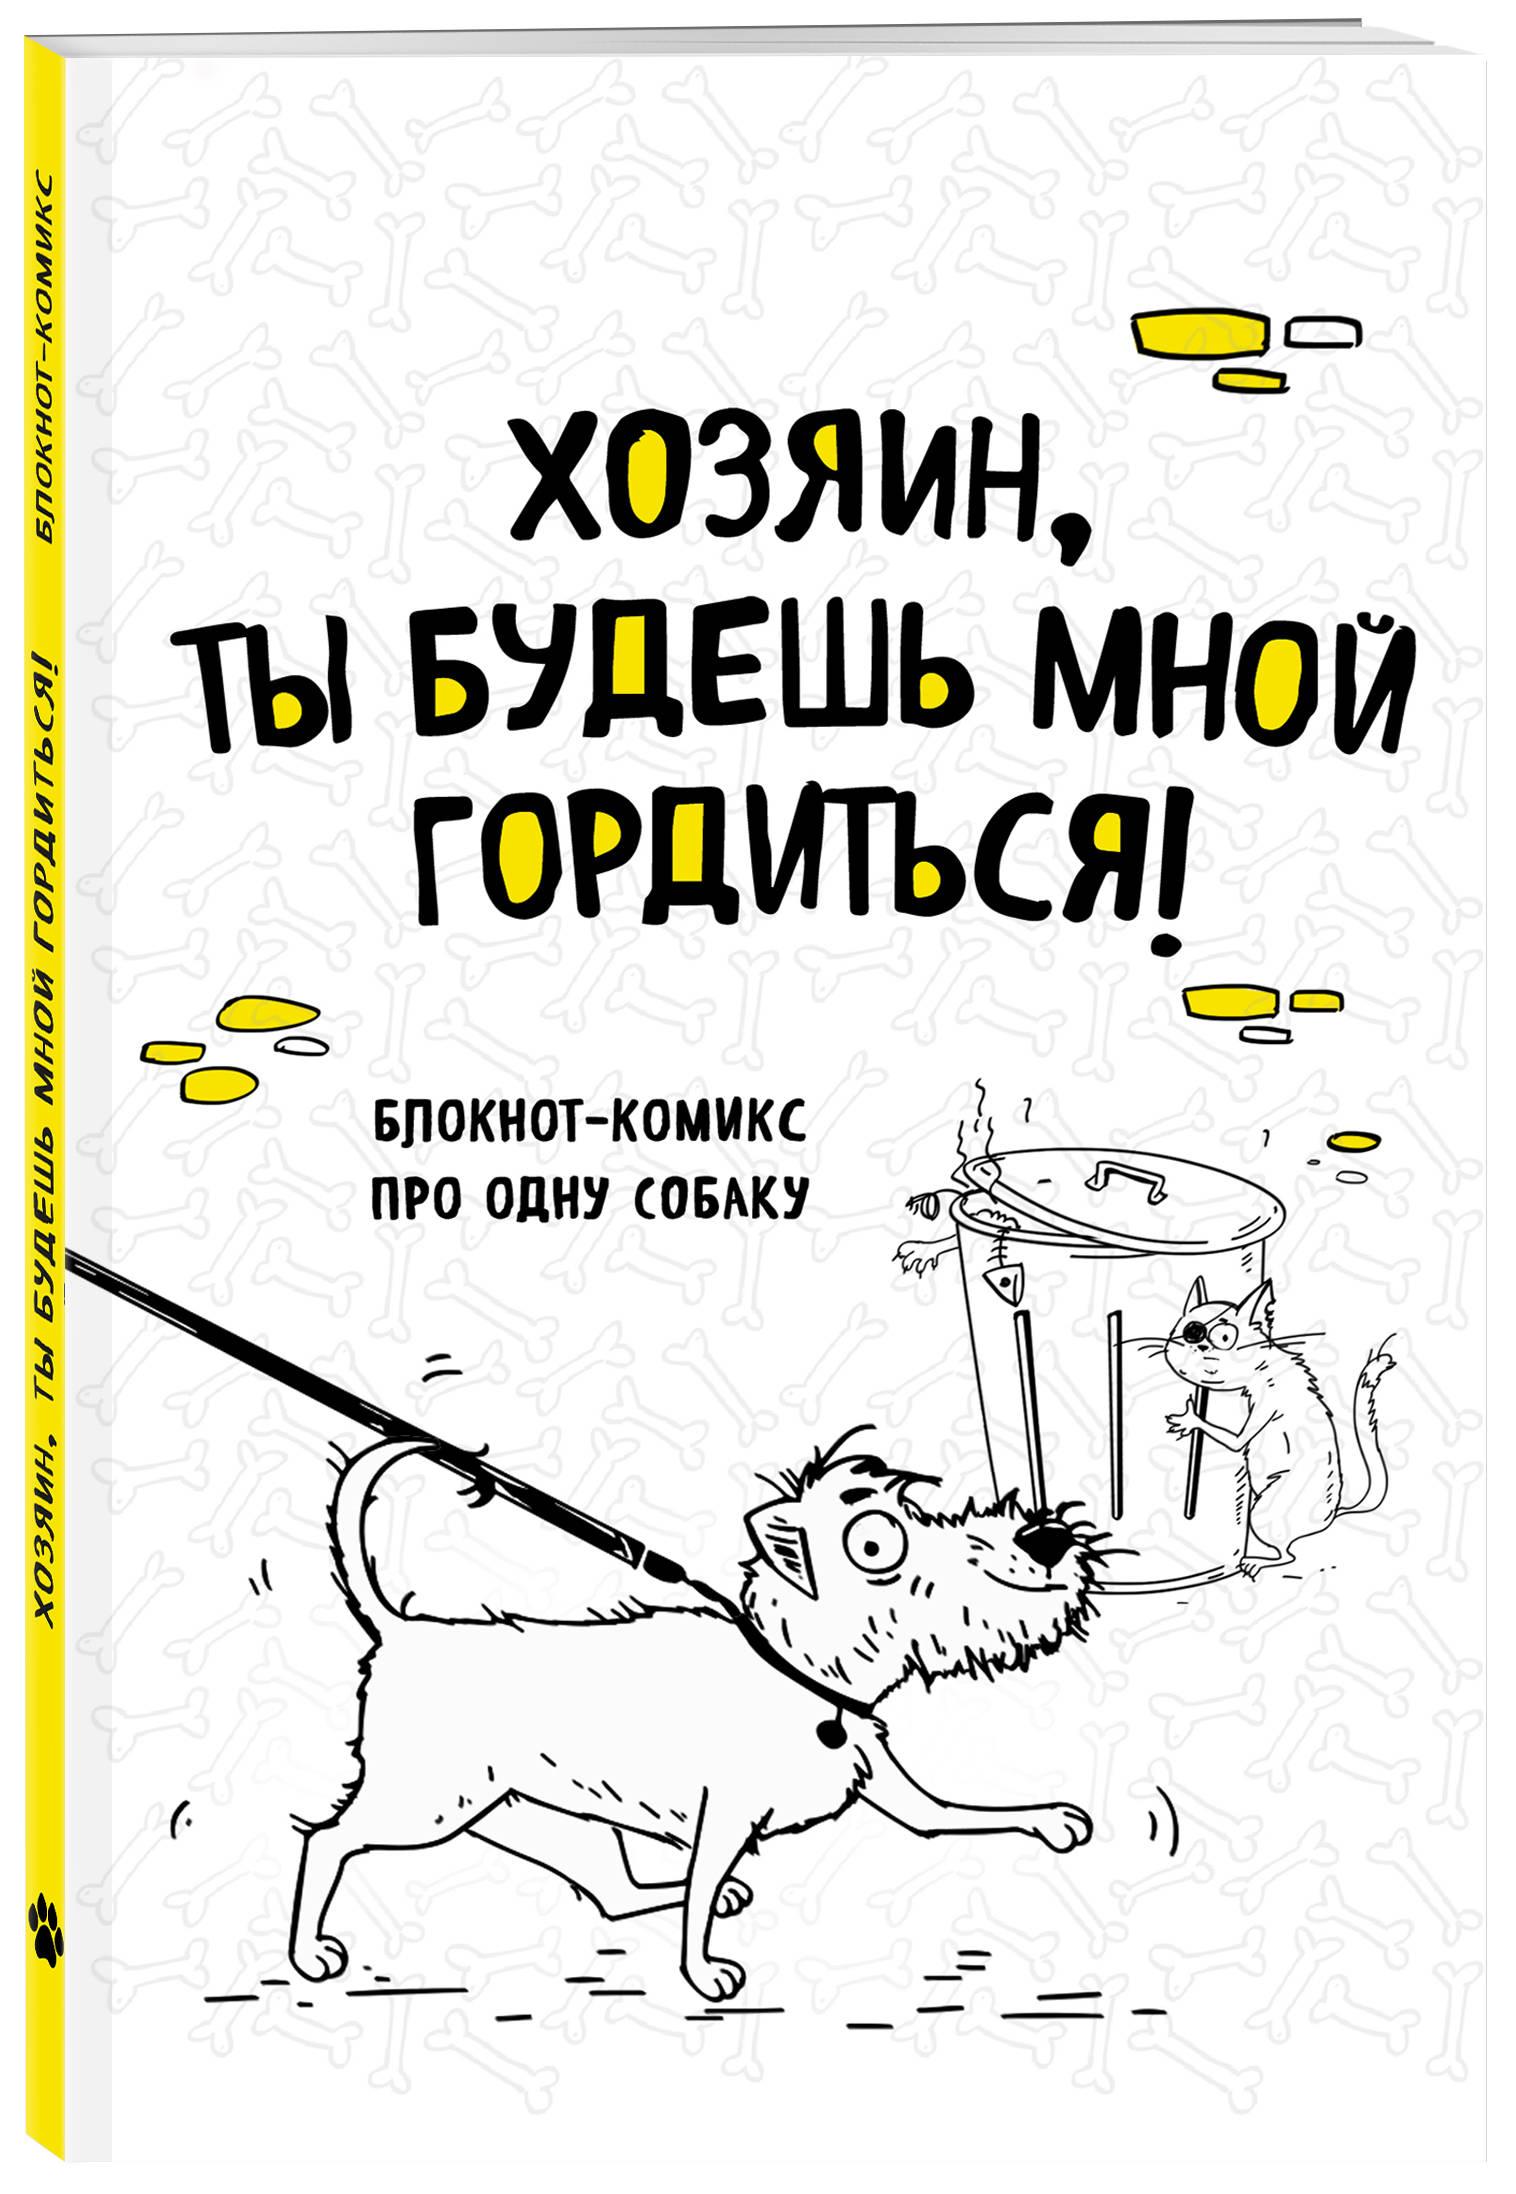 Bird B. Блокнот-комикс про одну собаку. Хозяин, ты будешь мной гордиться! книги эксмо хозяин собаки